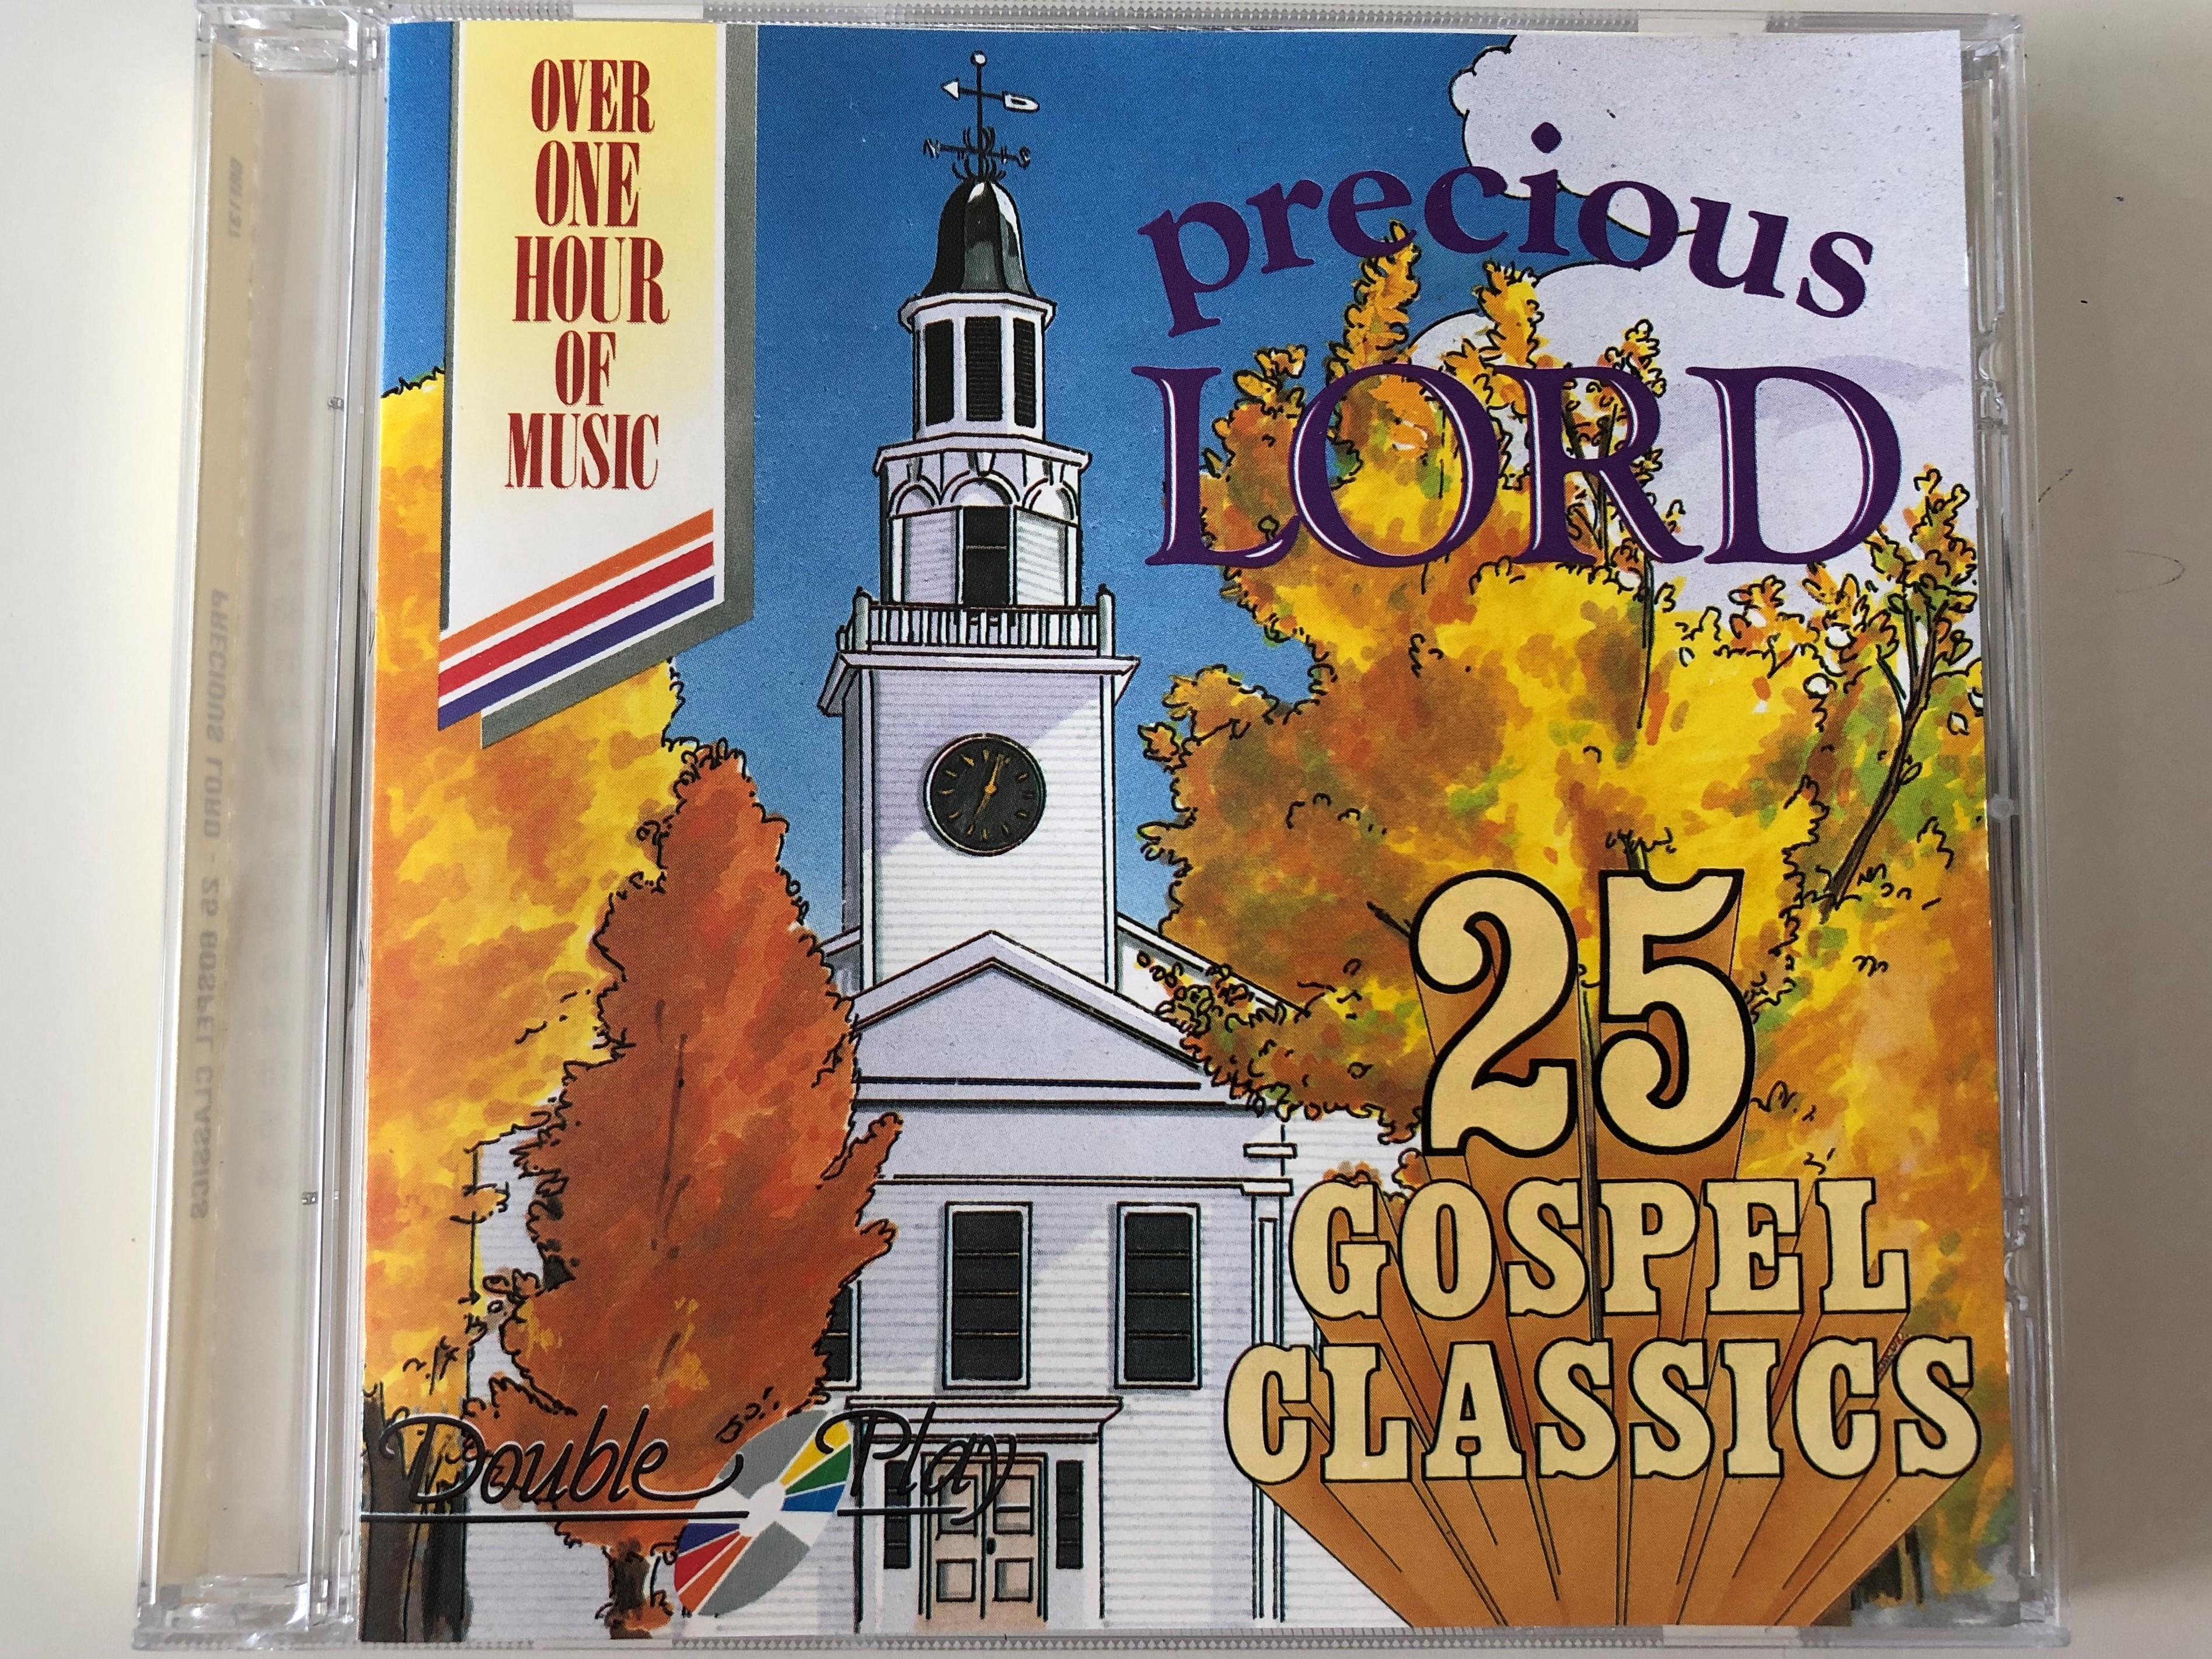 precious-lord-25-gospel-classics-over-one-hour-of-music-tring-international-plc-audio-cd-grf137-1-.jpg